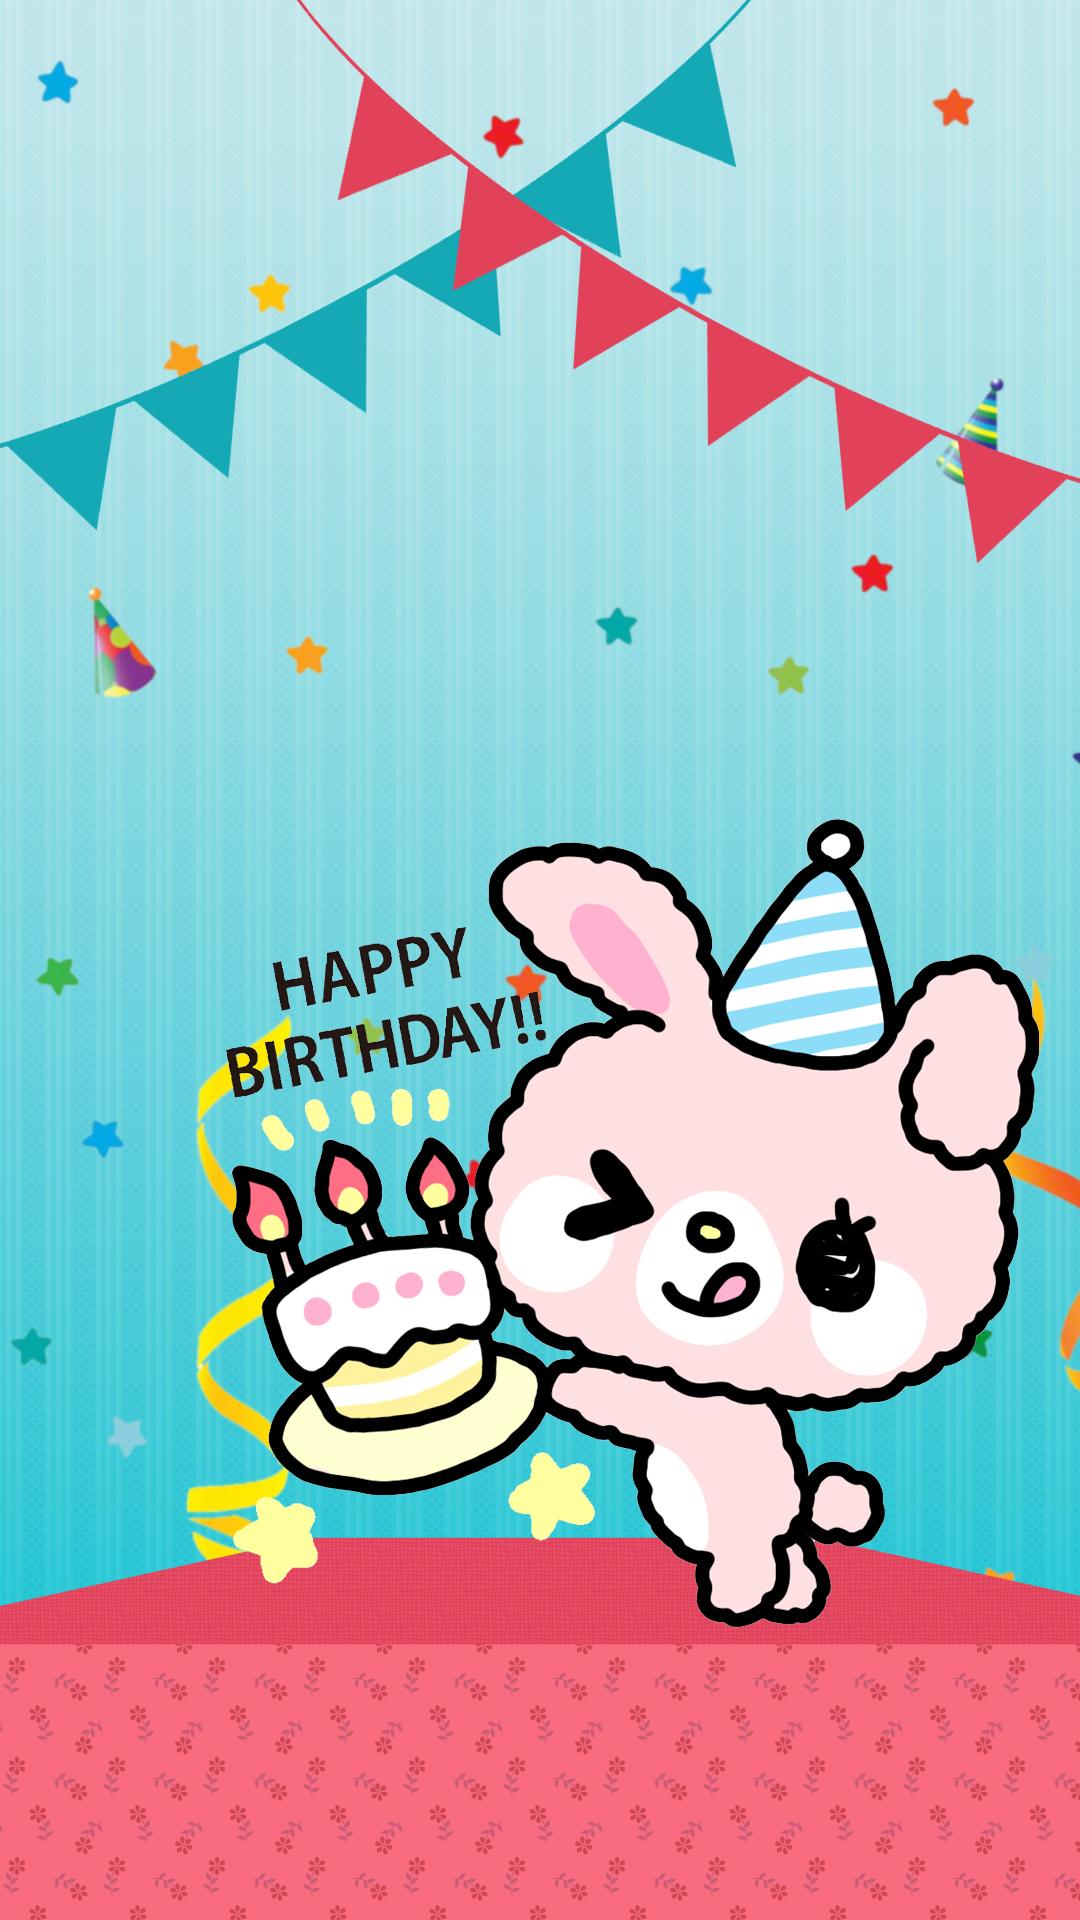 iPhone wallpaper happy Birthday!! Anime wallpaper